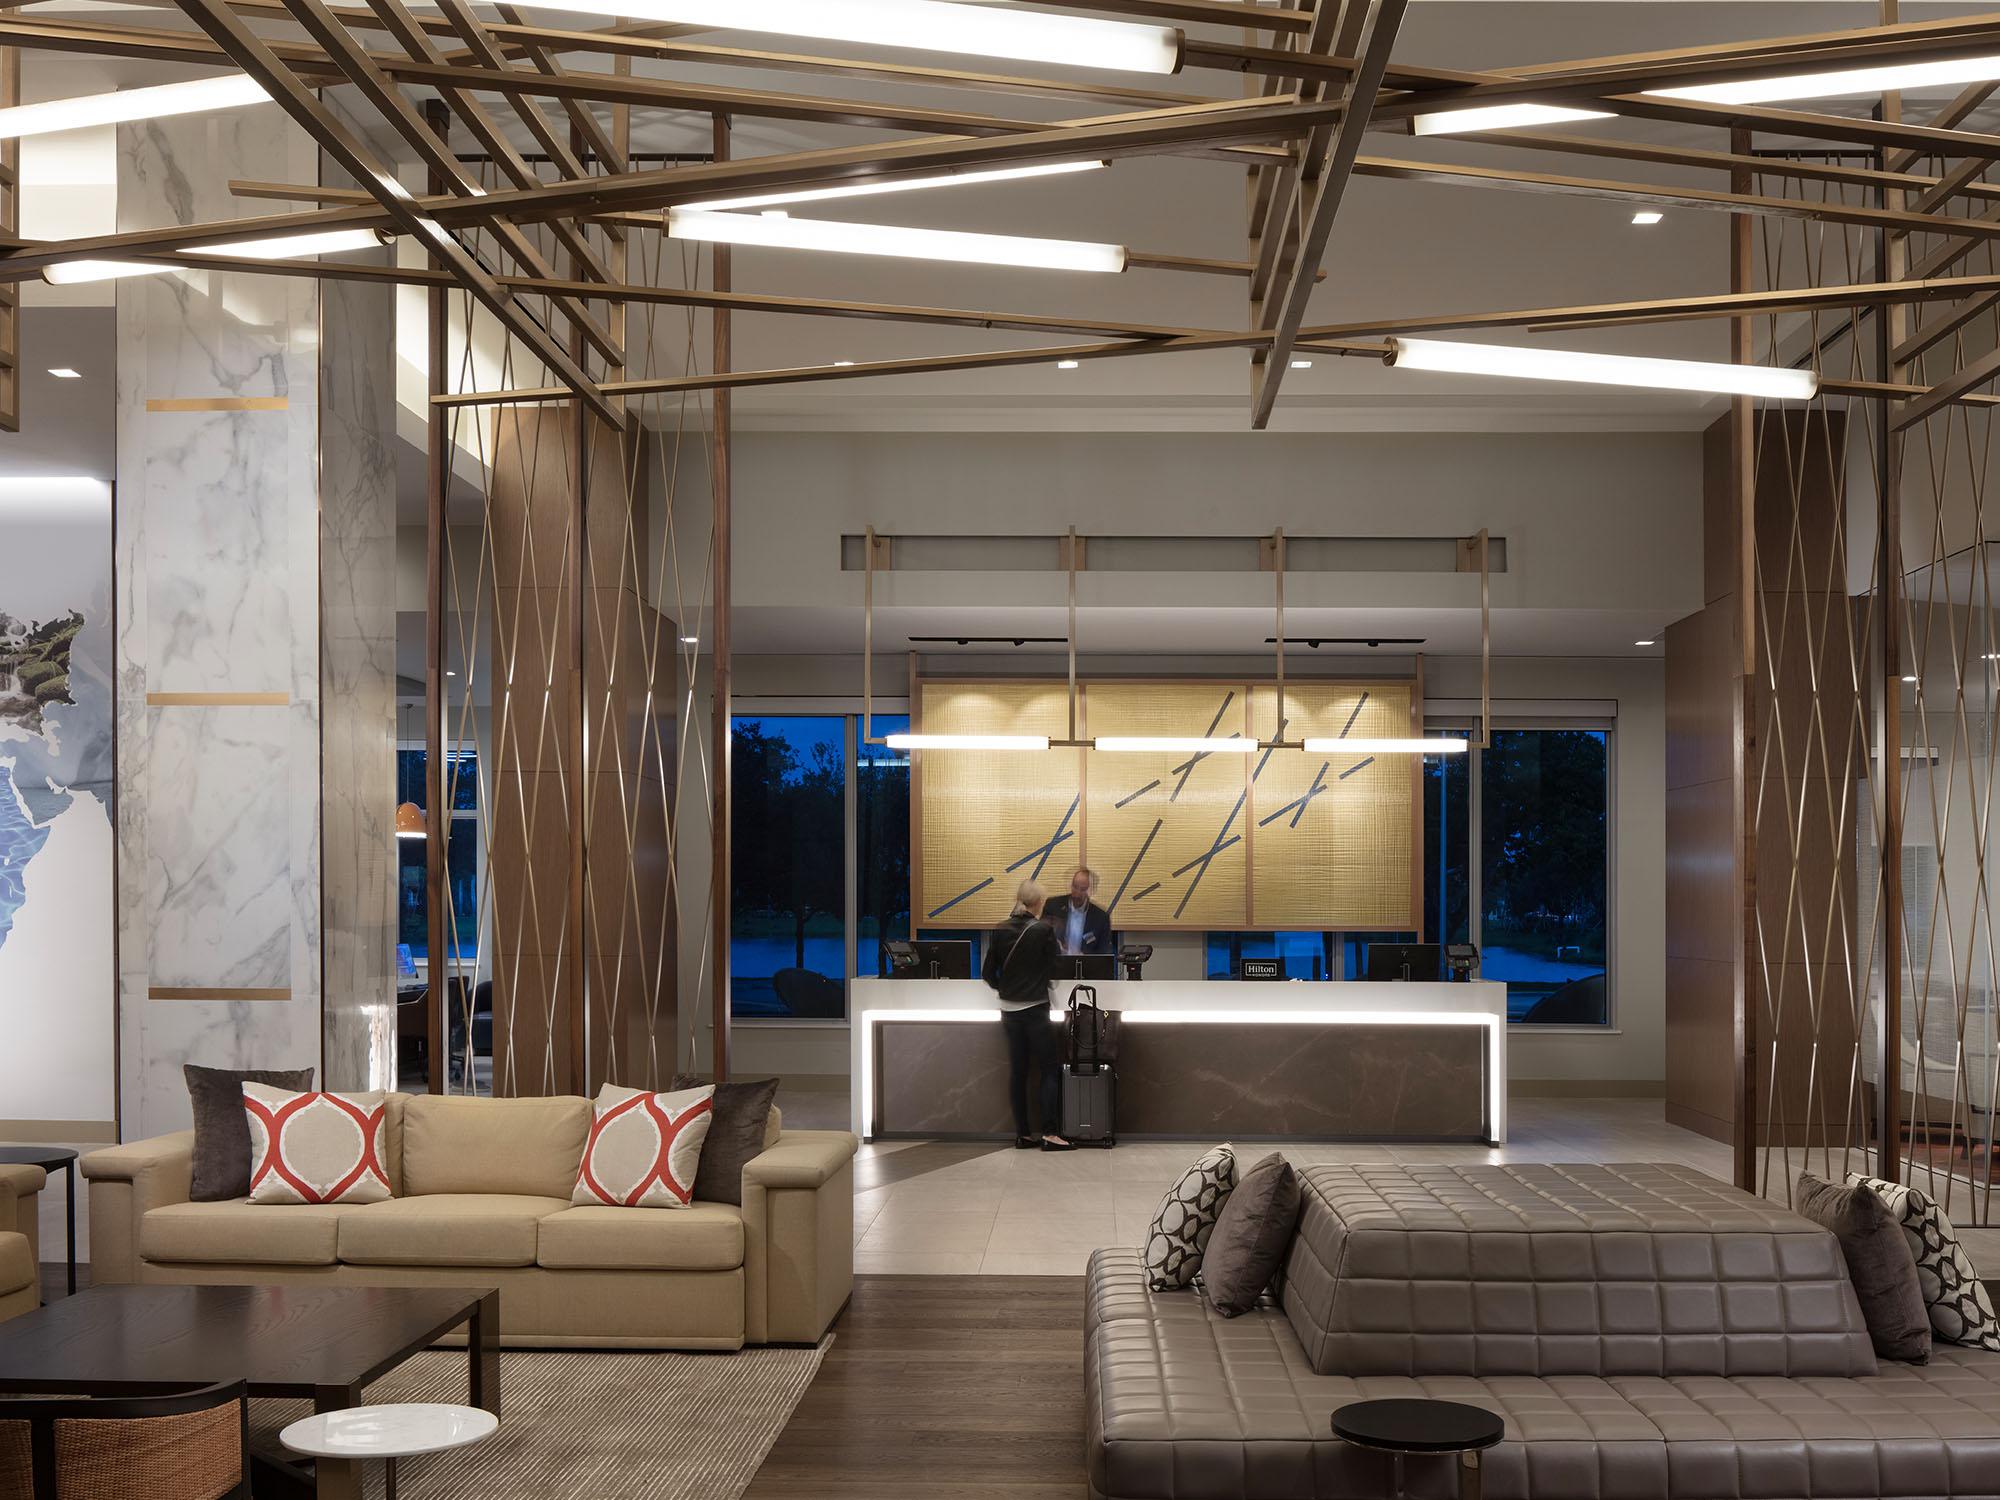 Hilton Miami Dadeland Hospitality Furniture Design _0000_RTKL_050819_9574.jpg